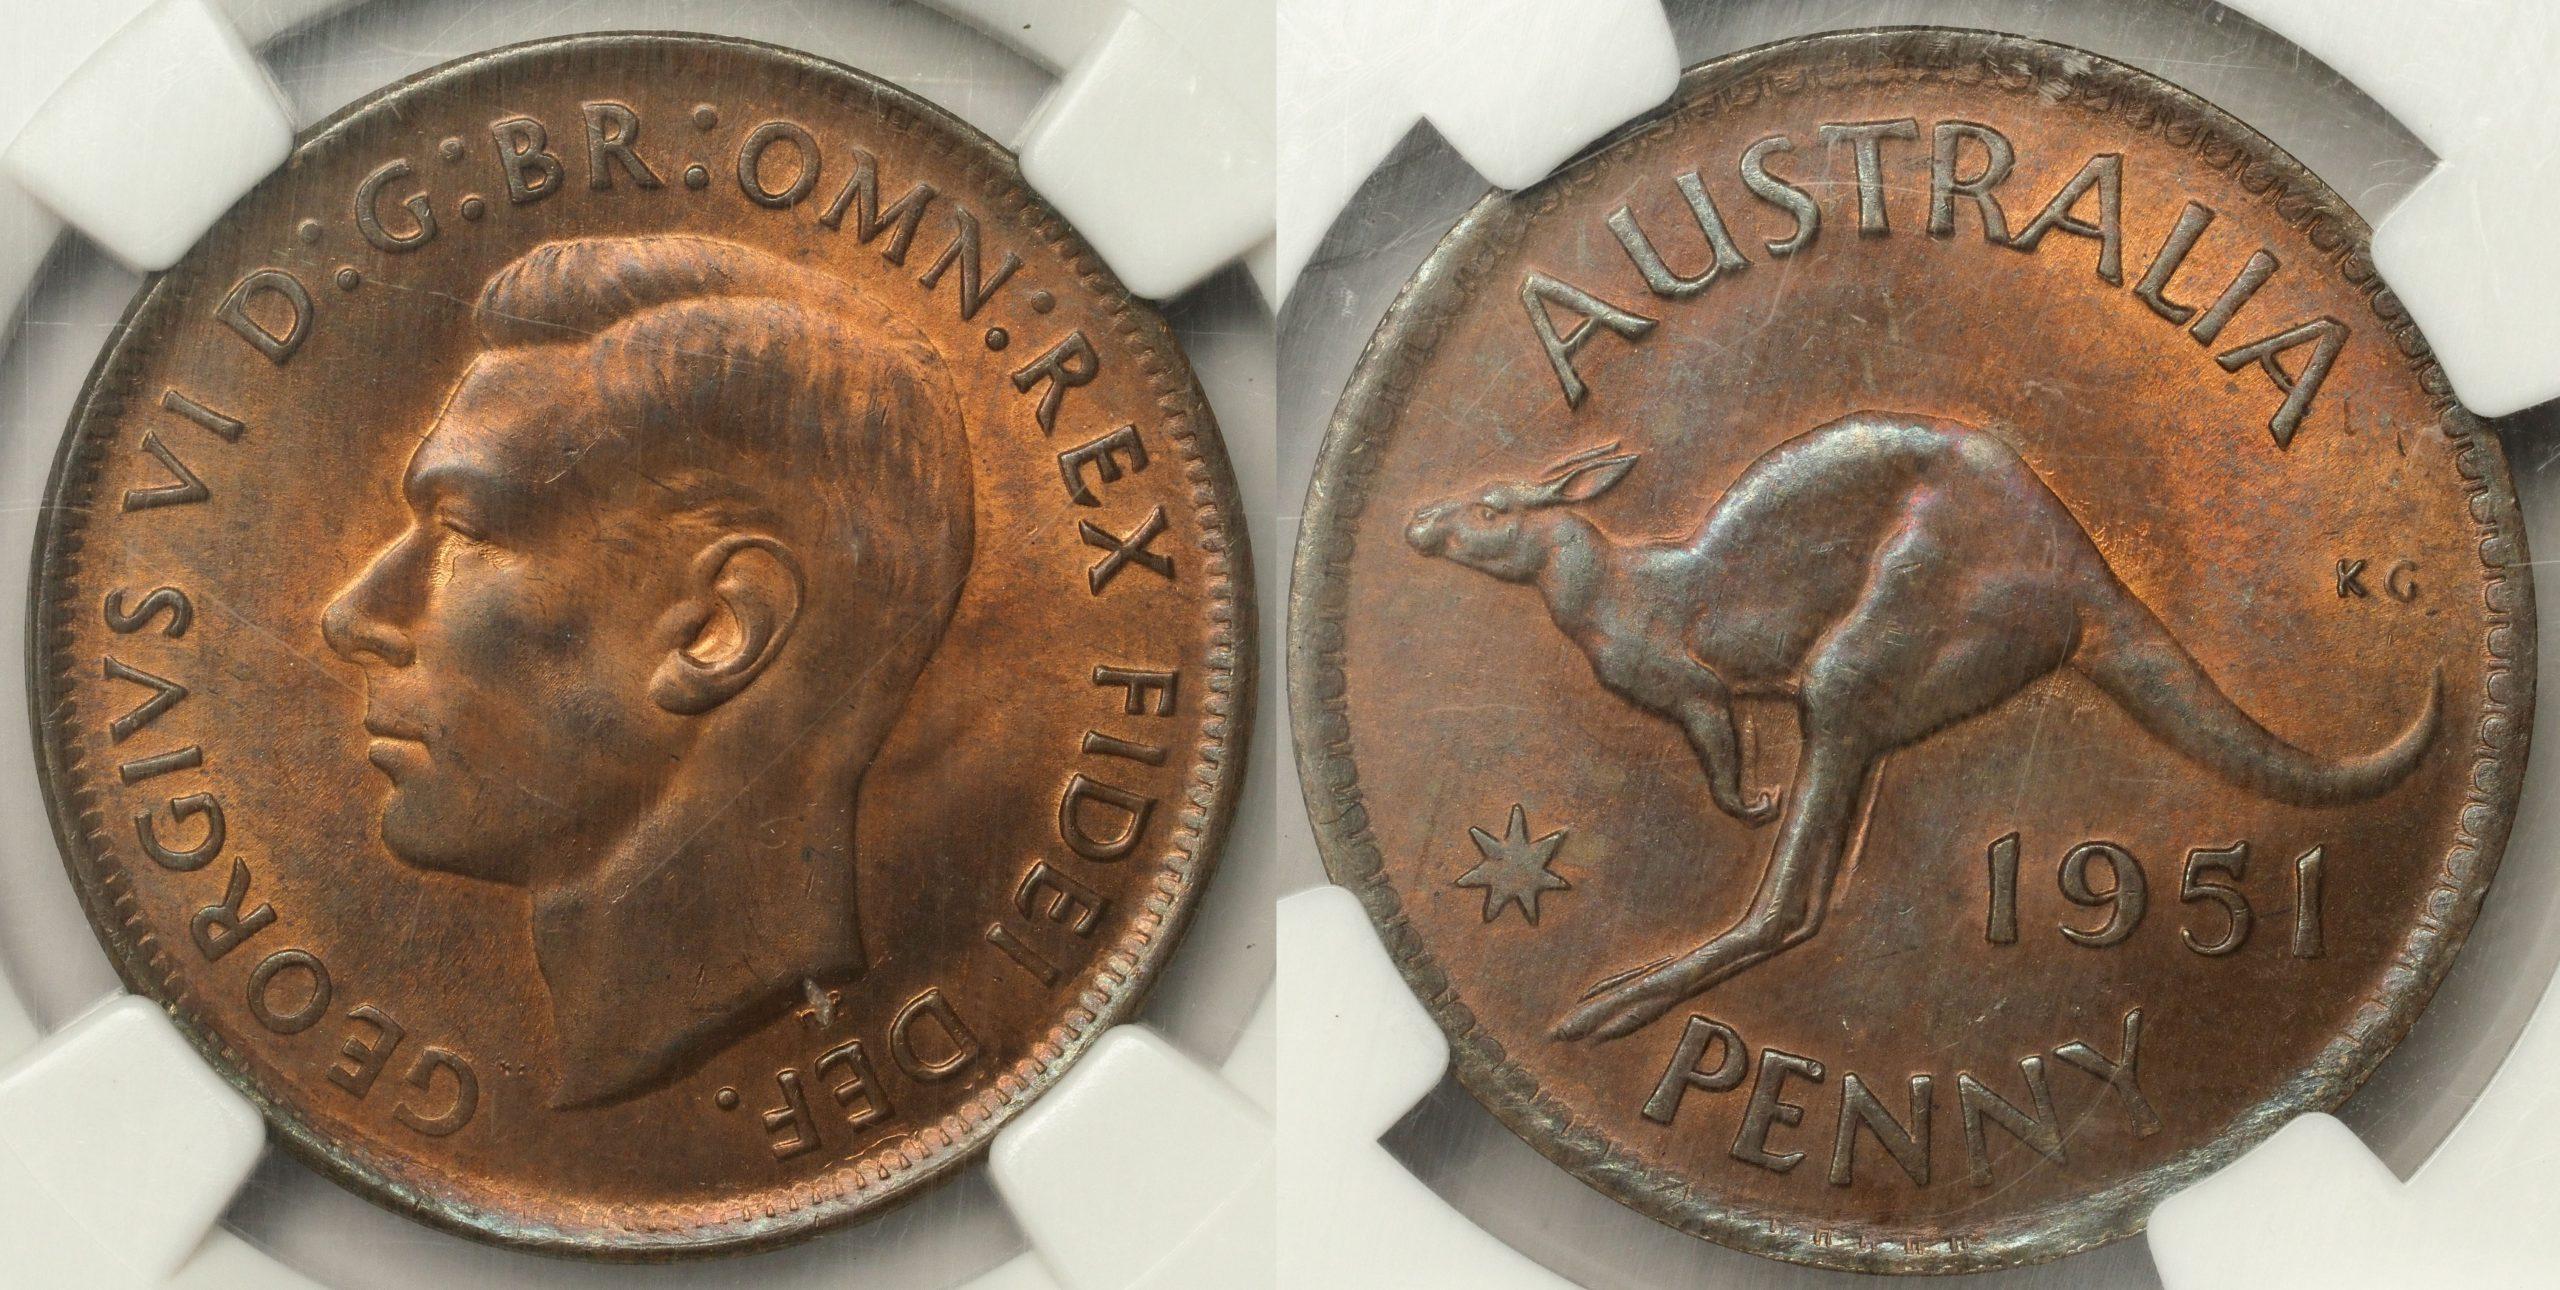 Australia 1951 Penny - NGC MS64RB